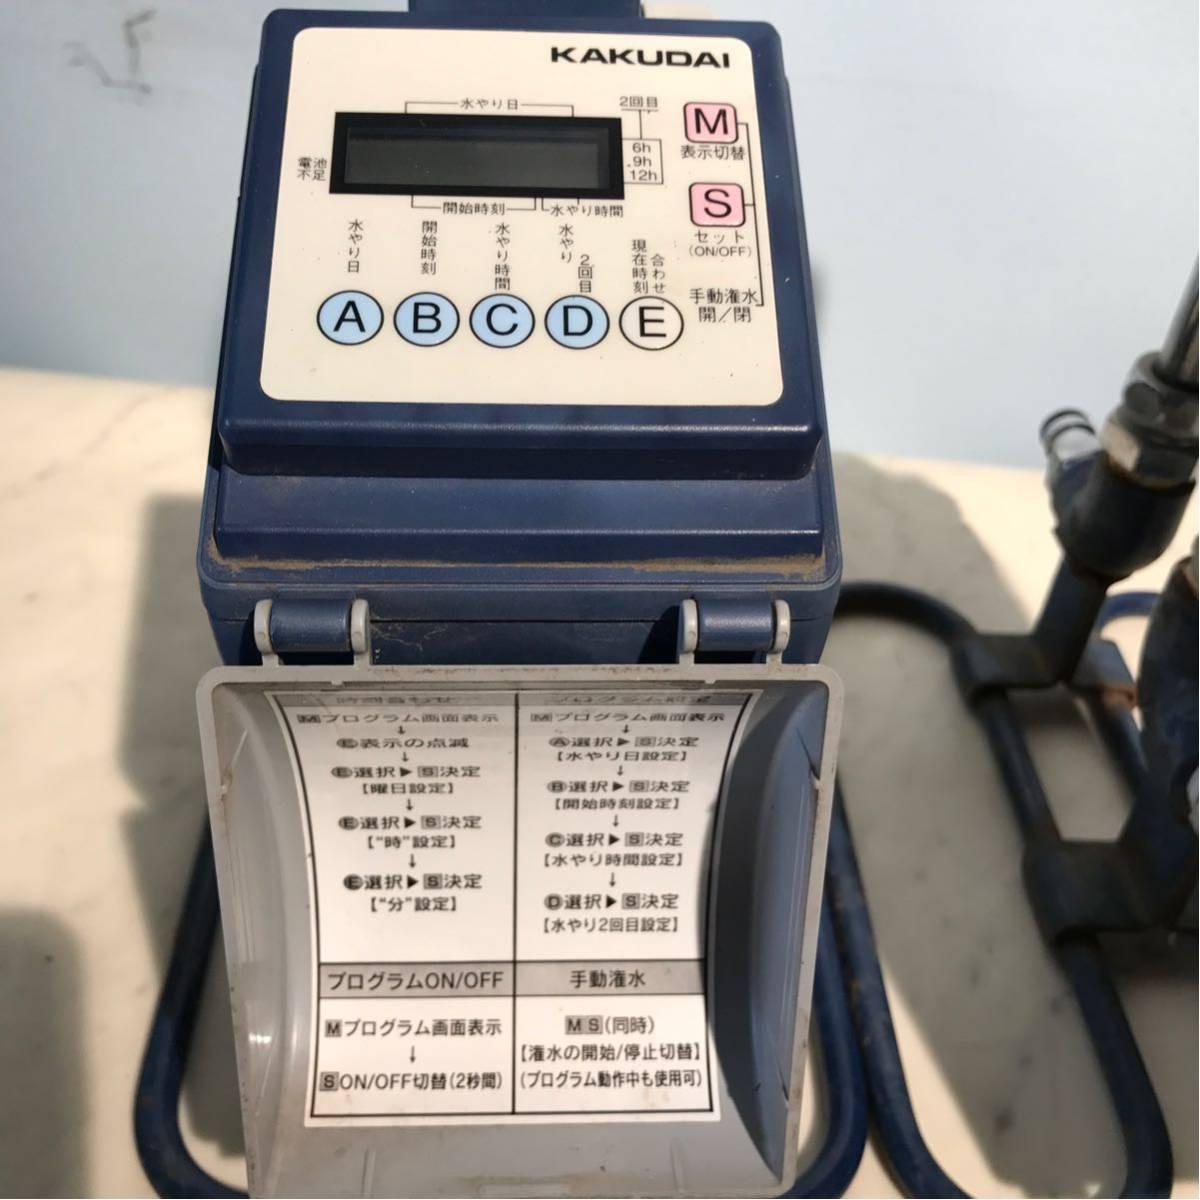 R91★ KAKUDAI カクダイ 潅水コンピュータージュニア 散水 水やり 自動 タイマー 電池式 _画像5